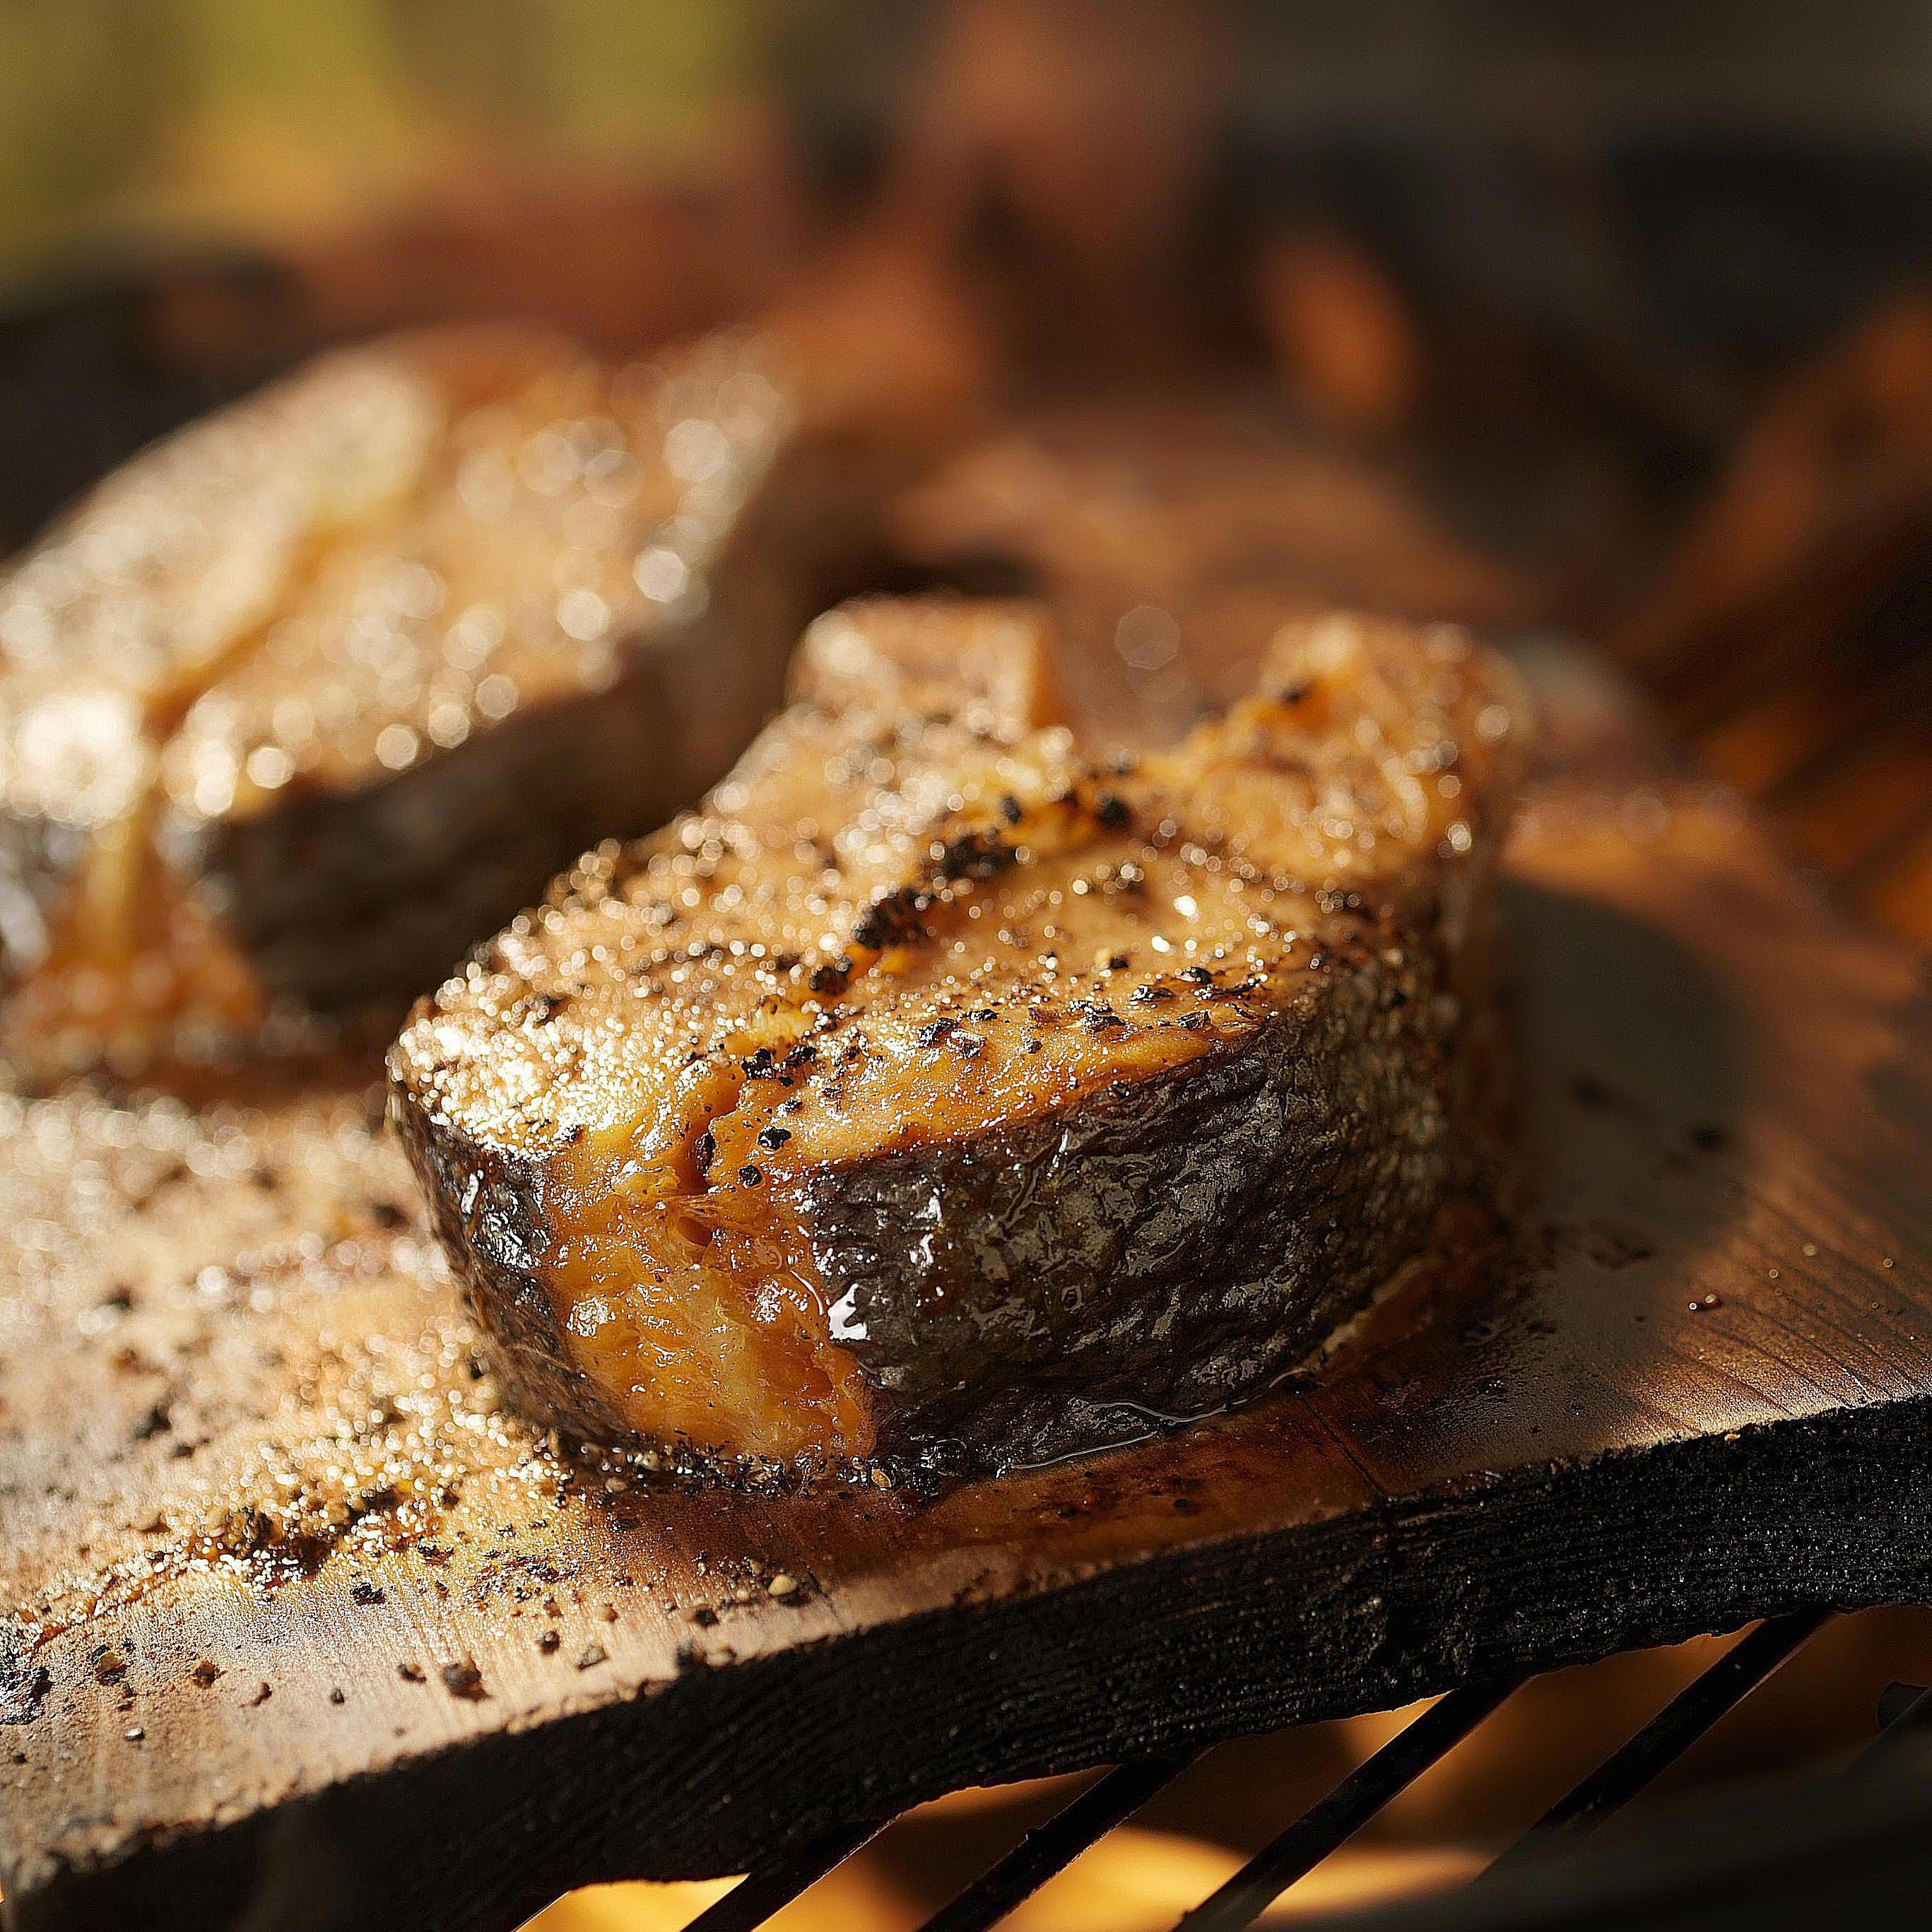 Plank Grilled Salmon Steaks